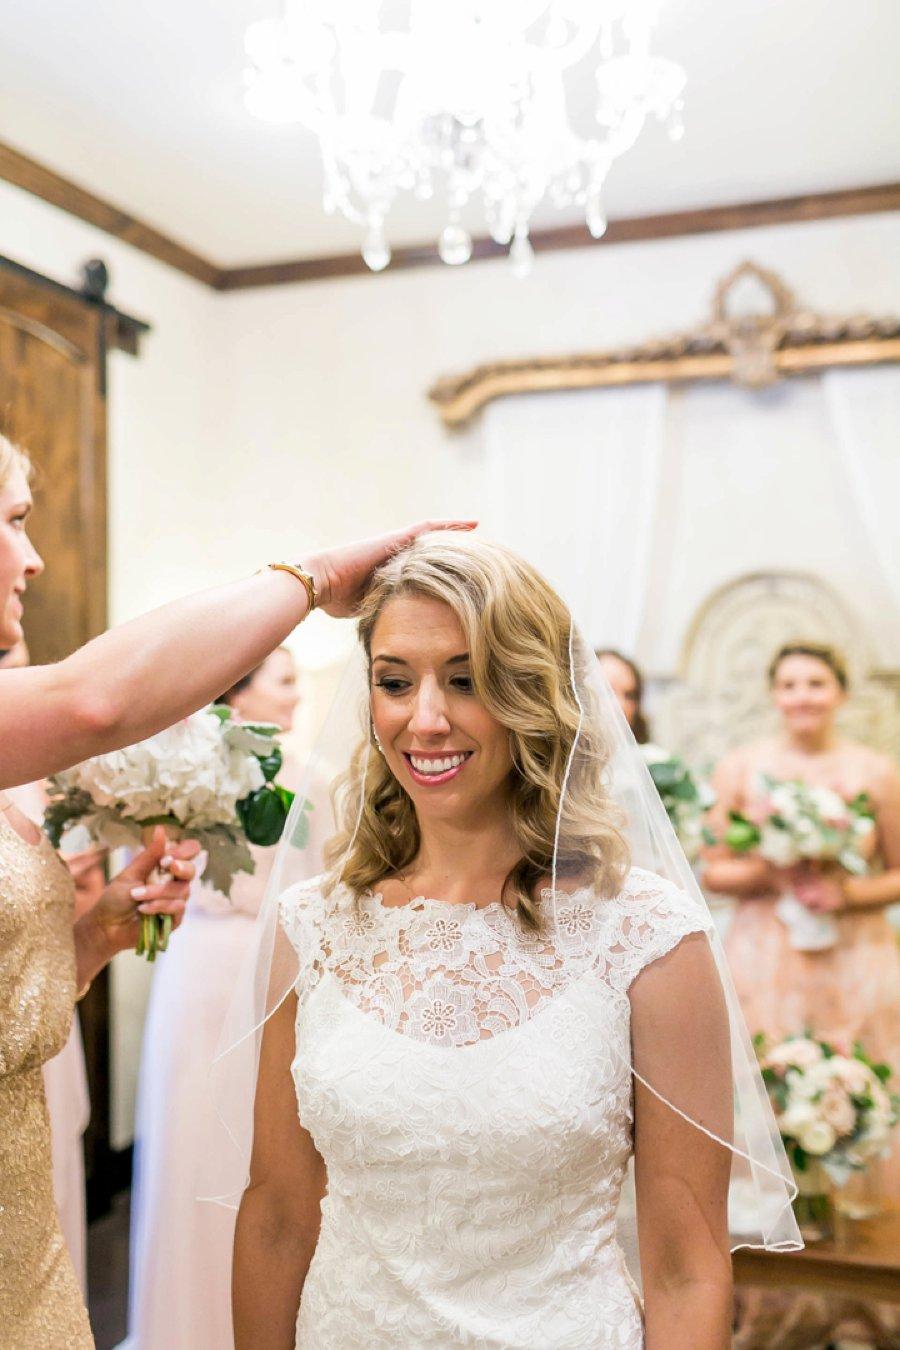 An Elegant Blush & Champagne Texas Destination Wedding via TheELD.com